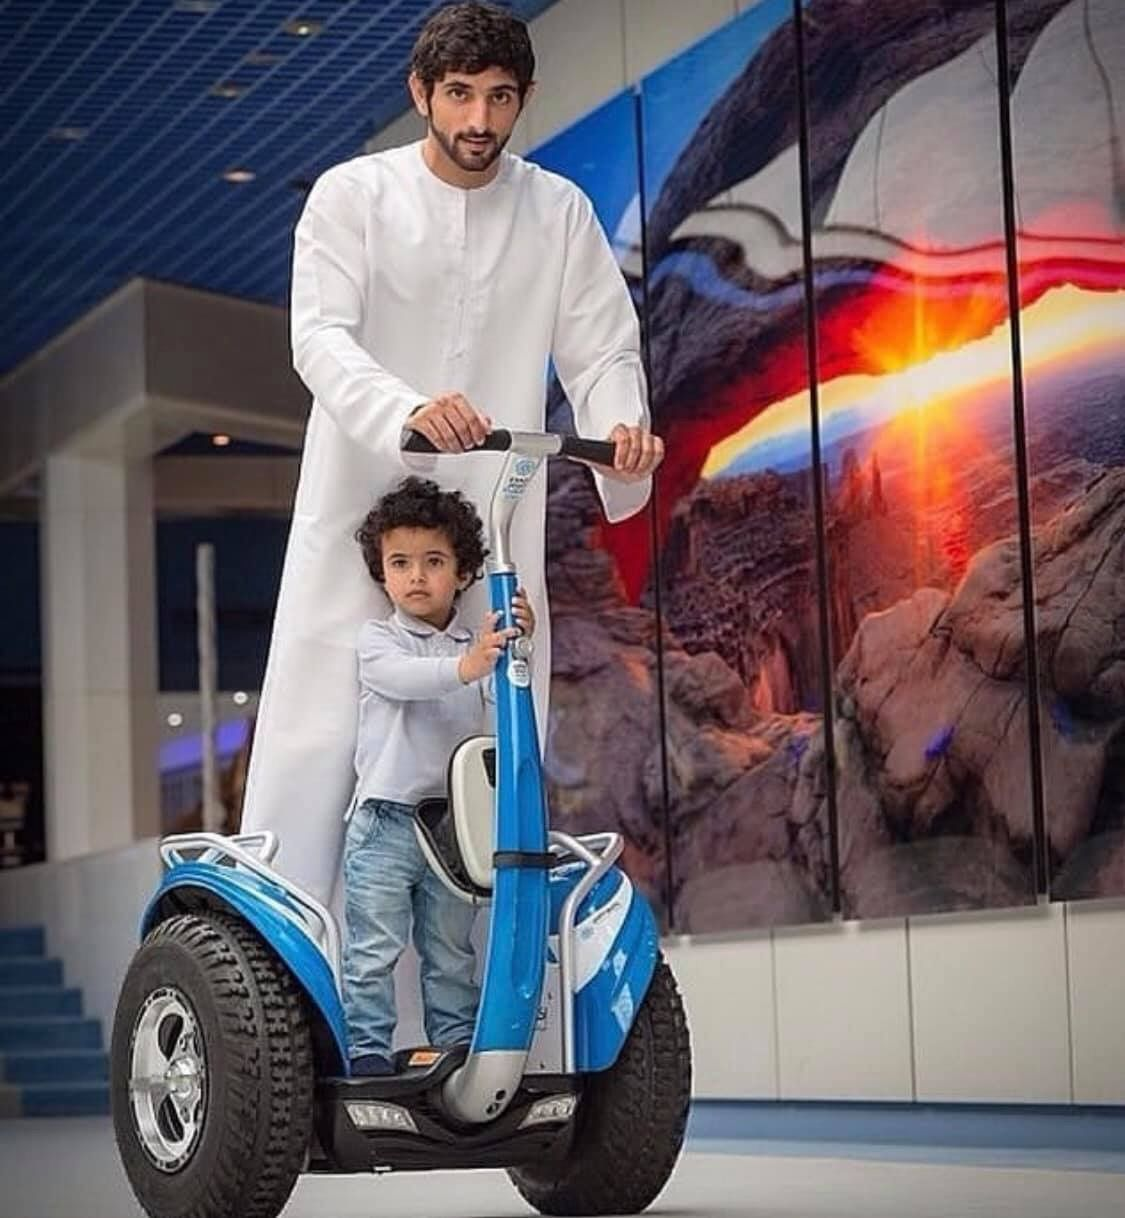 Pin By Salha Alkindi On Faz3 Handsome Prince Dubai City Prince